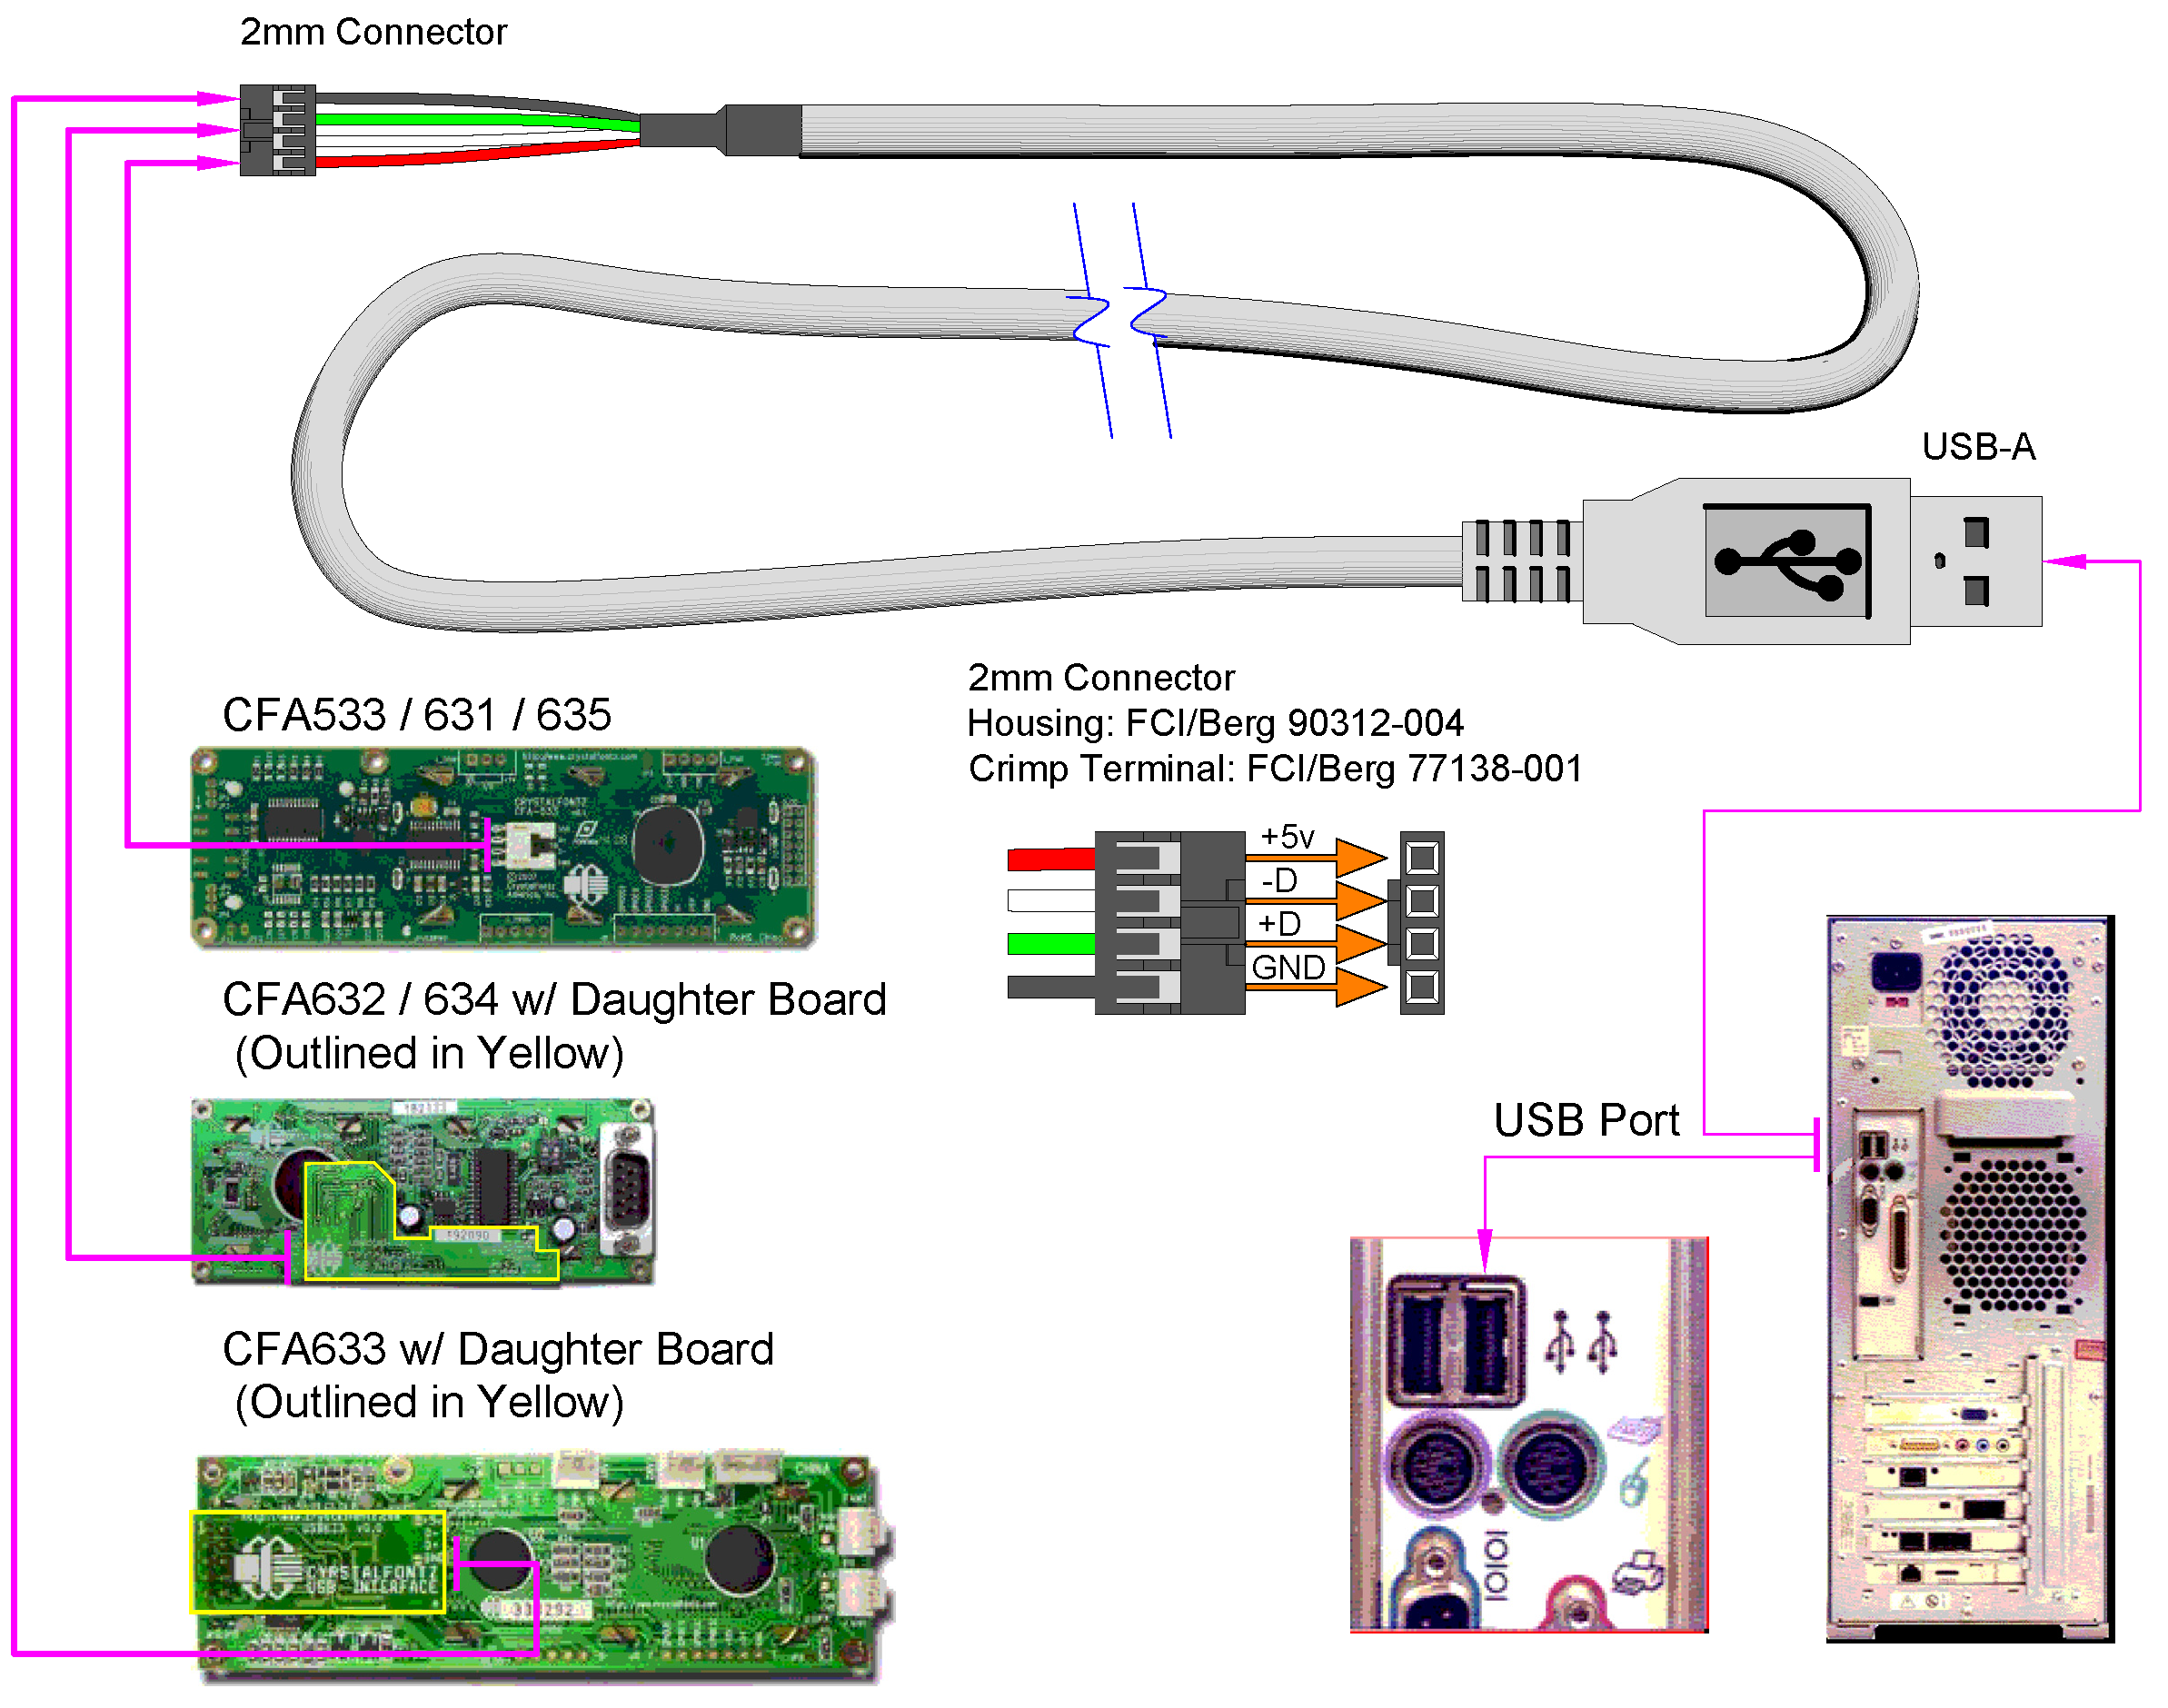 medium resolution of best of wiring diagram micro usb diagrams digramssample diagramimages wiringdiagramsample wiringdiagram